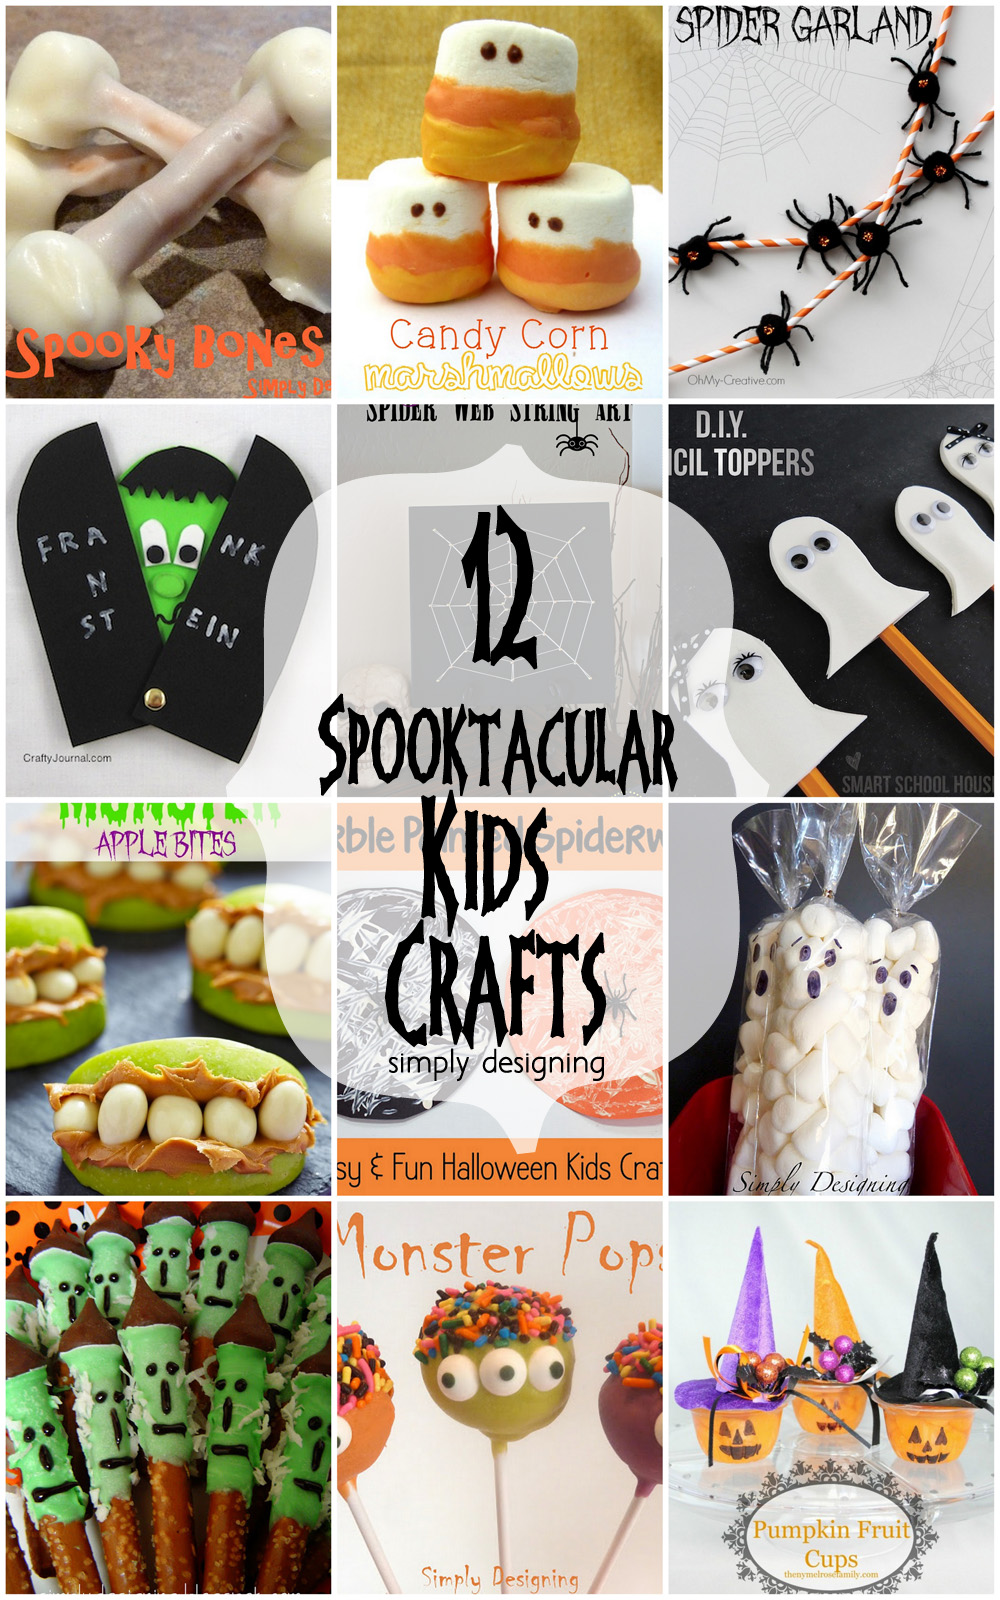 12 Spooktacular Halloween Kid Crafts